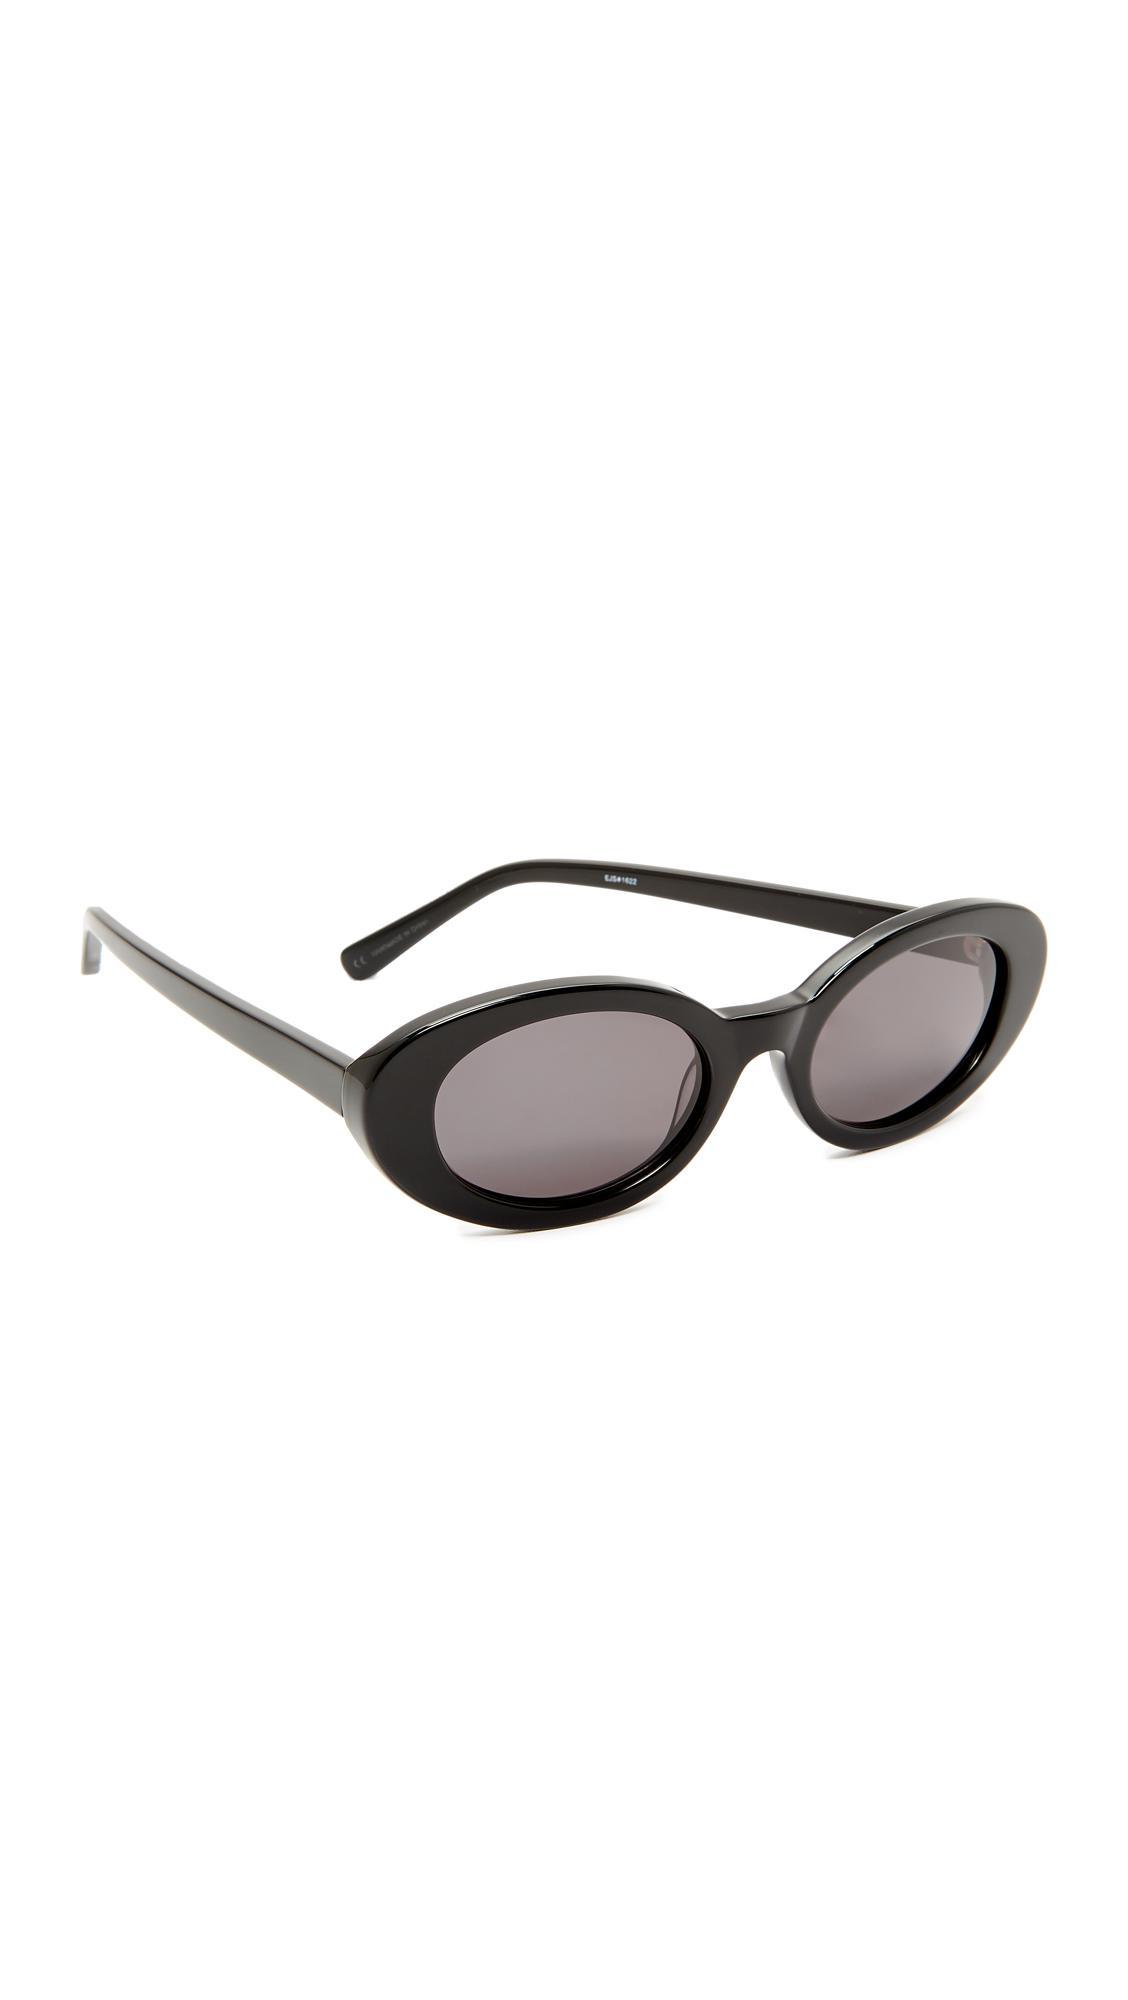 20d549ebc5 Elizabeth and James Mckinley Sunglasses in Black - Lyst